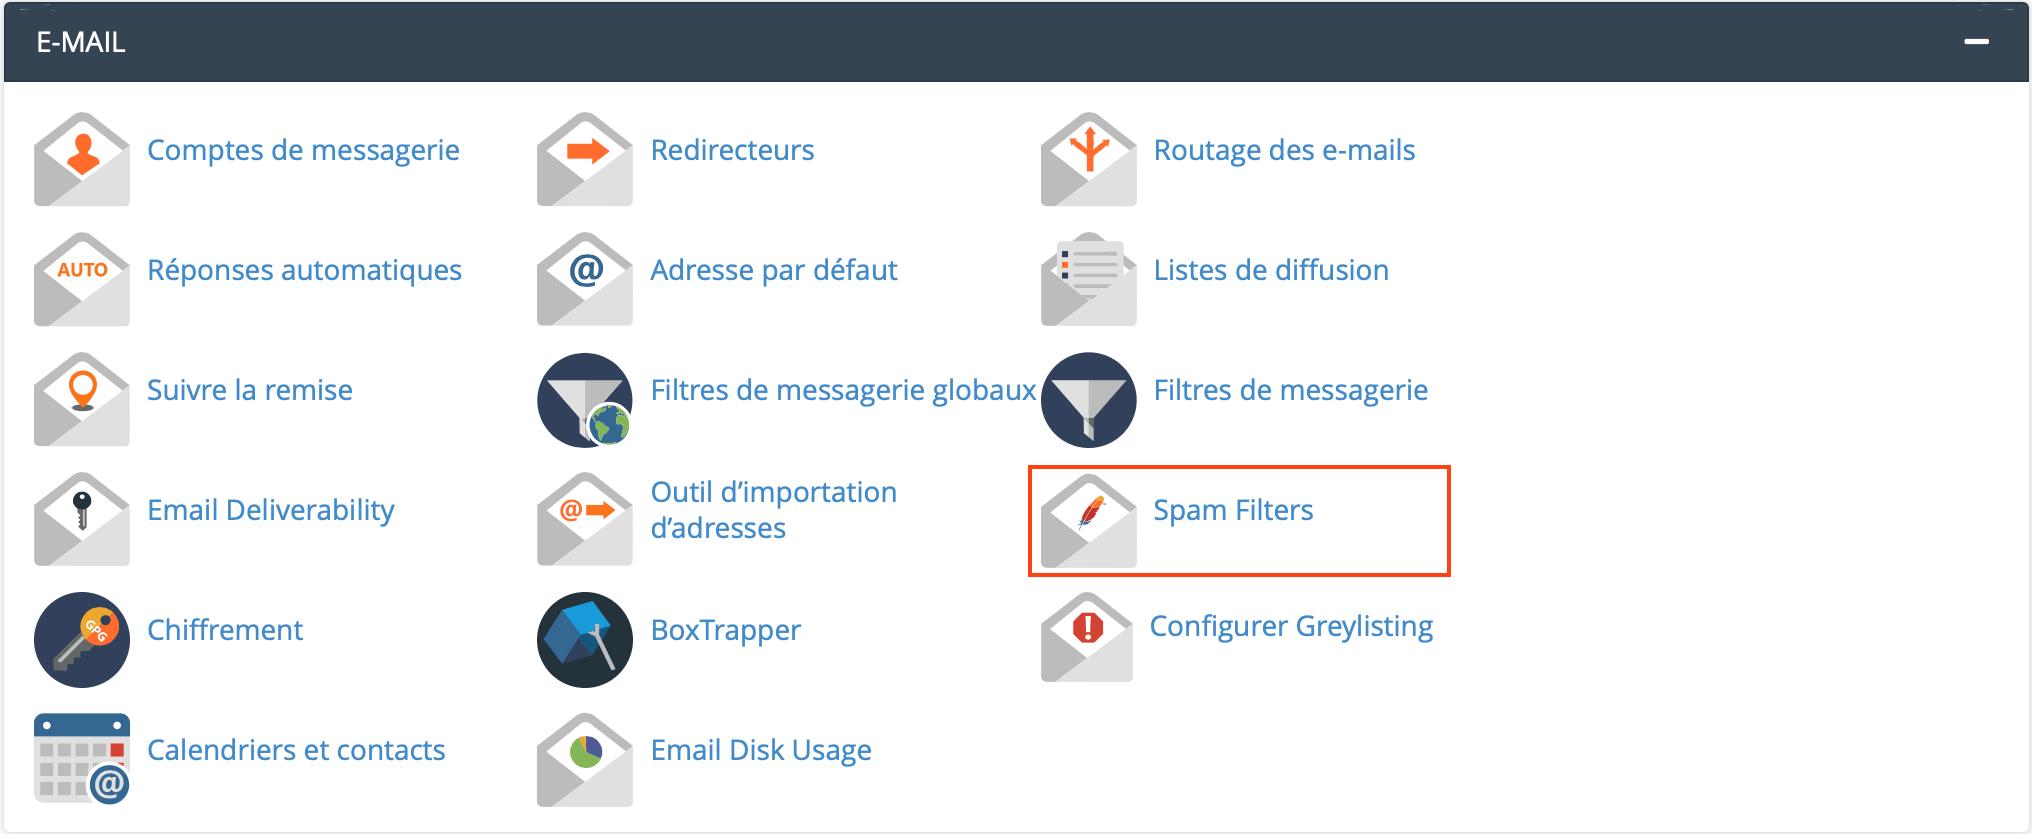 Spam Filters sur cPanel